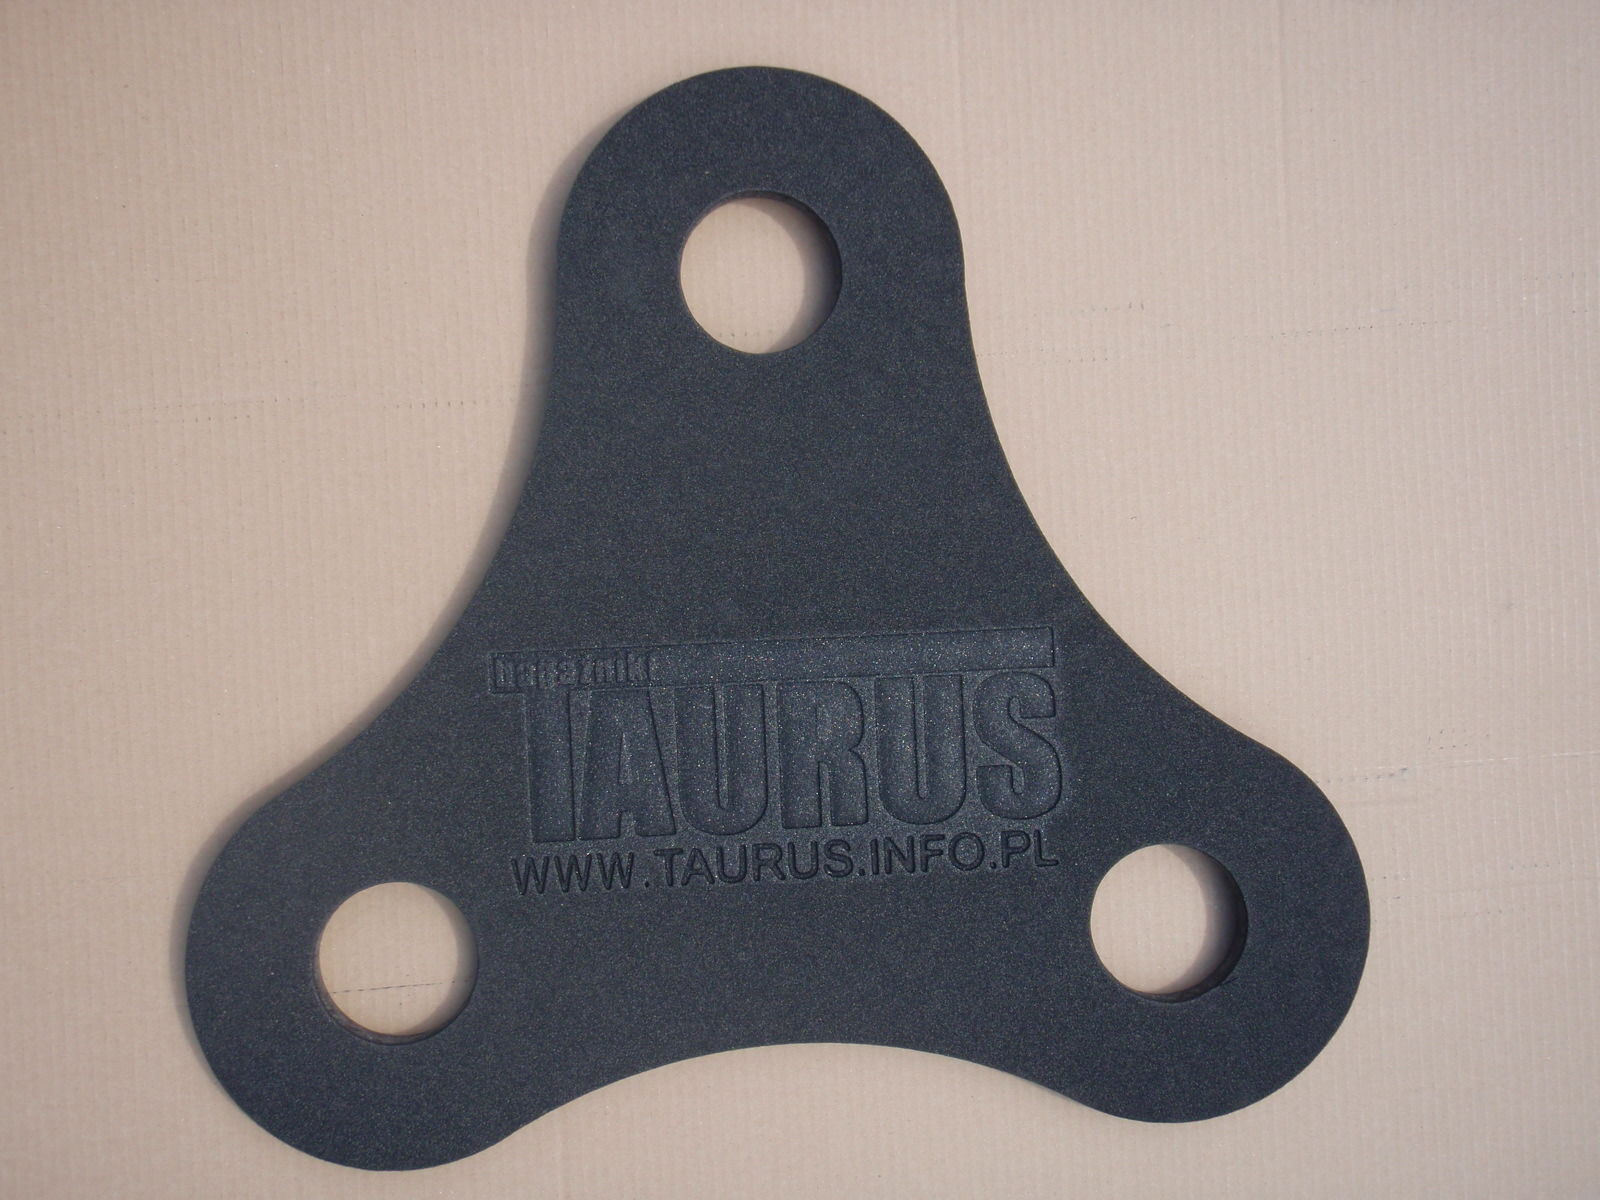 Taurus Fender